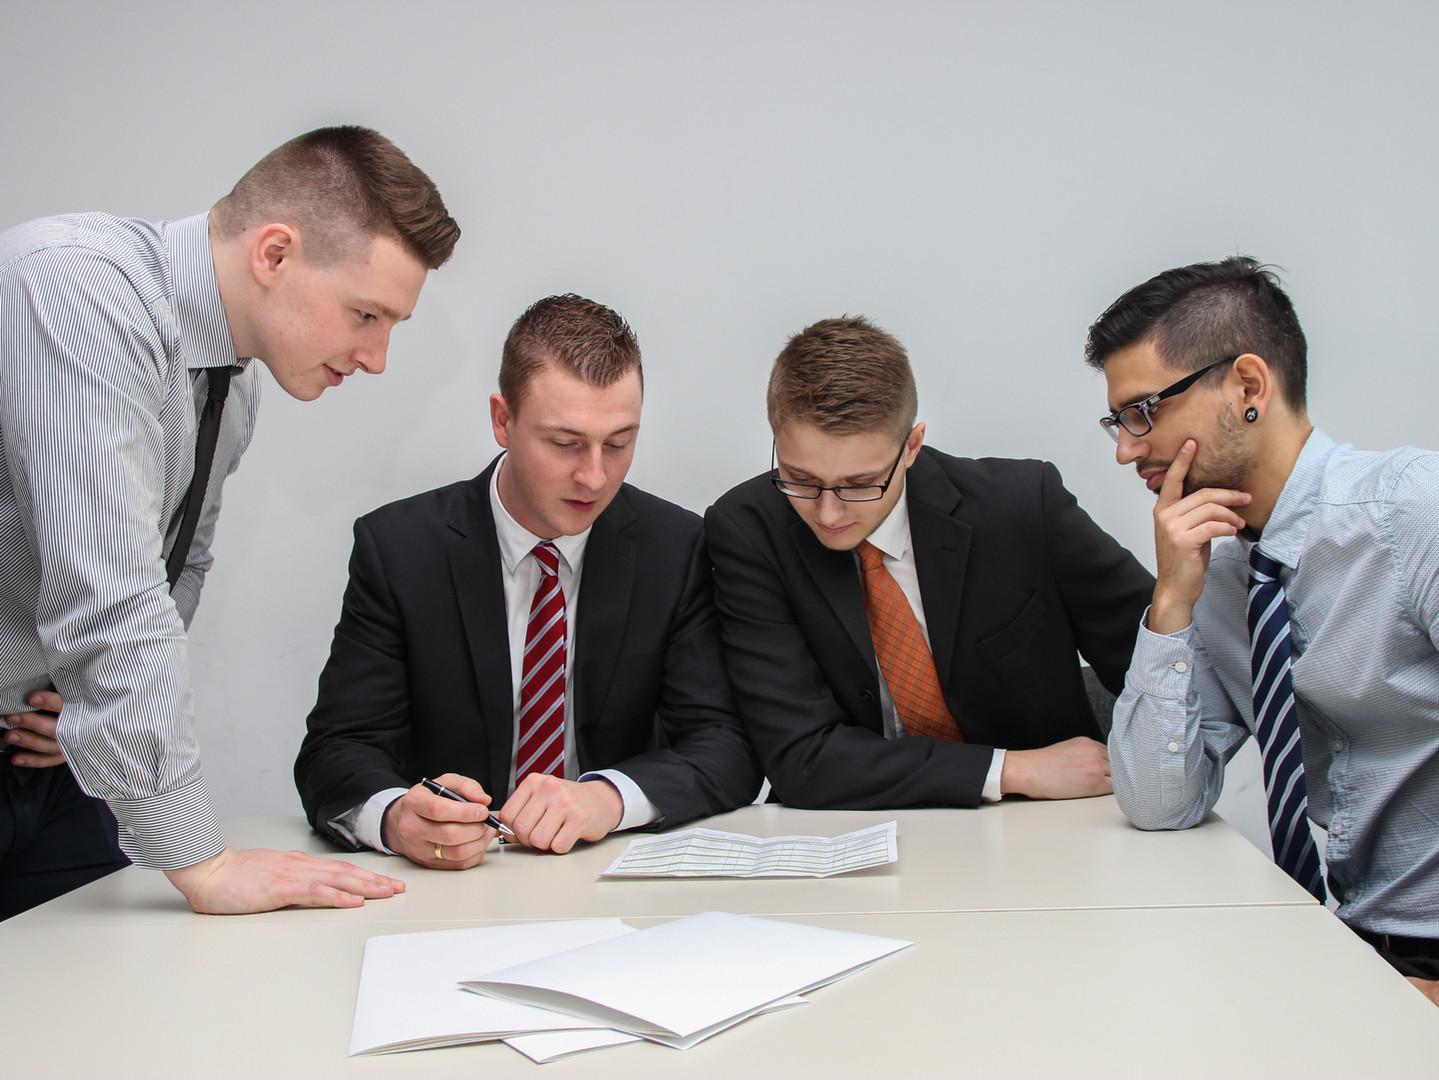 Human Resources (HR) Solution